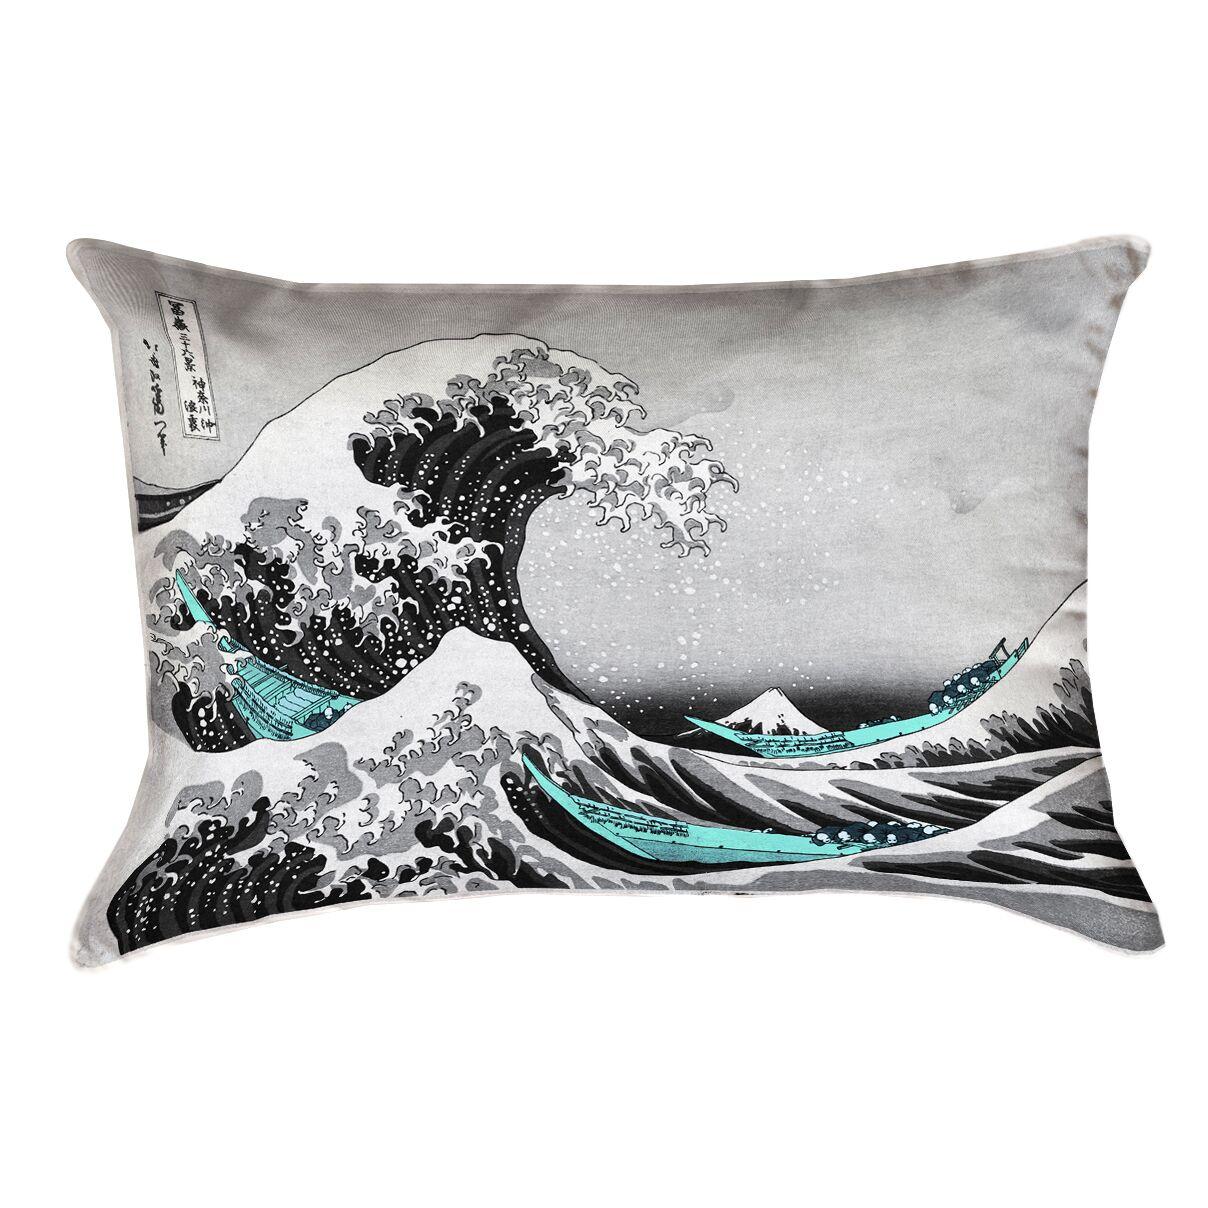 Raritan The Great Wave Cotton Pillow Cover Color: Teal/Gray